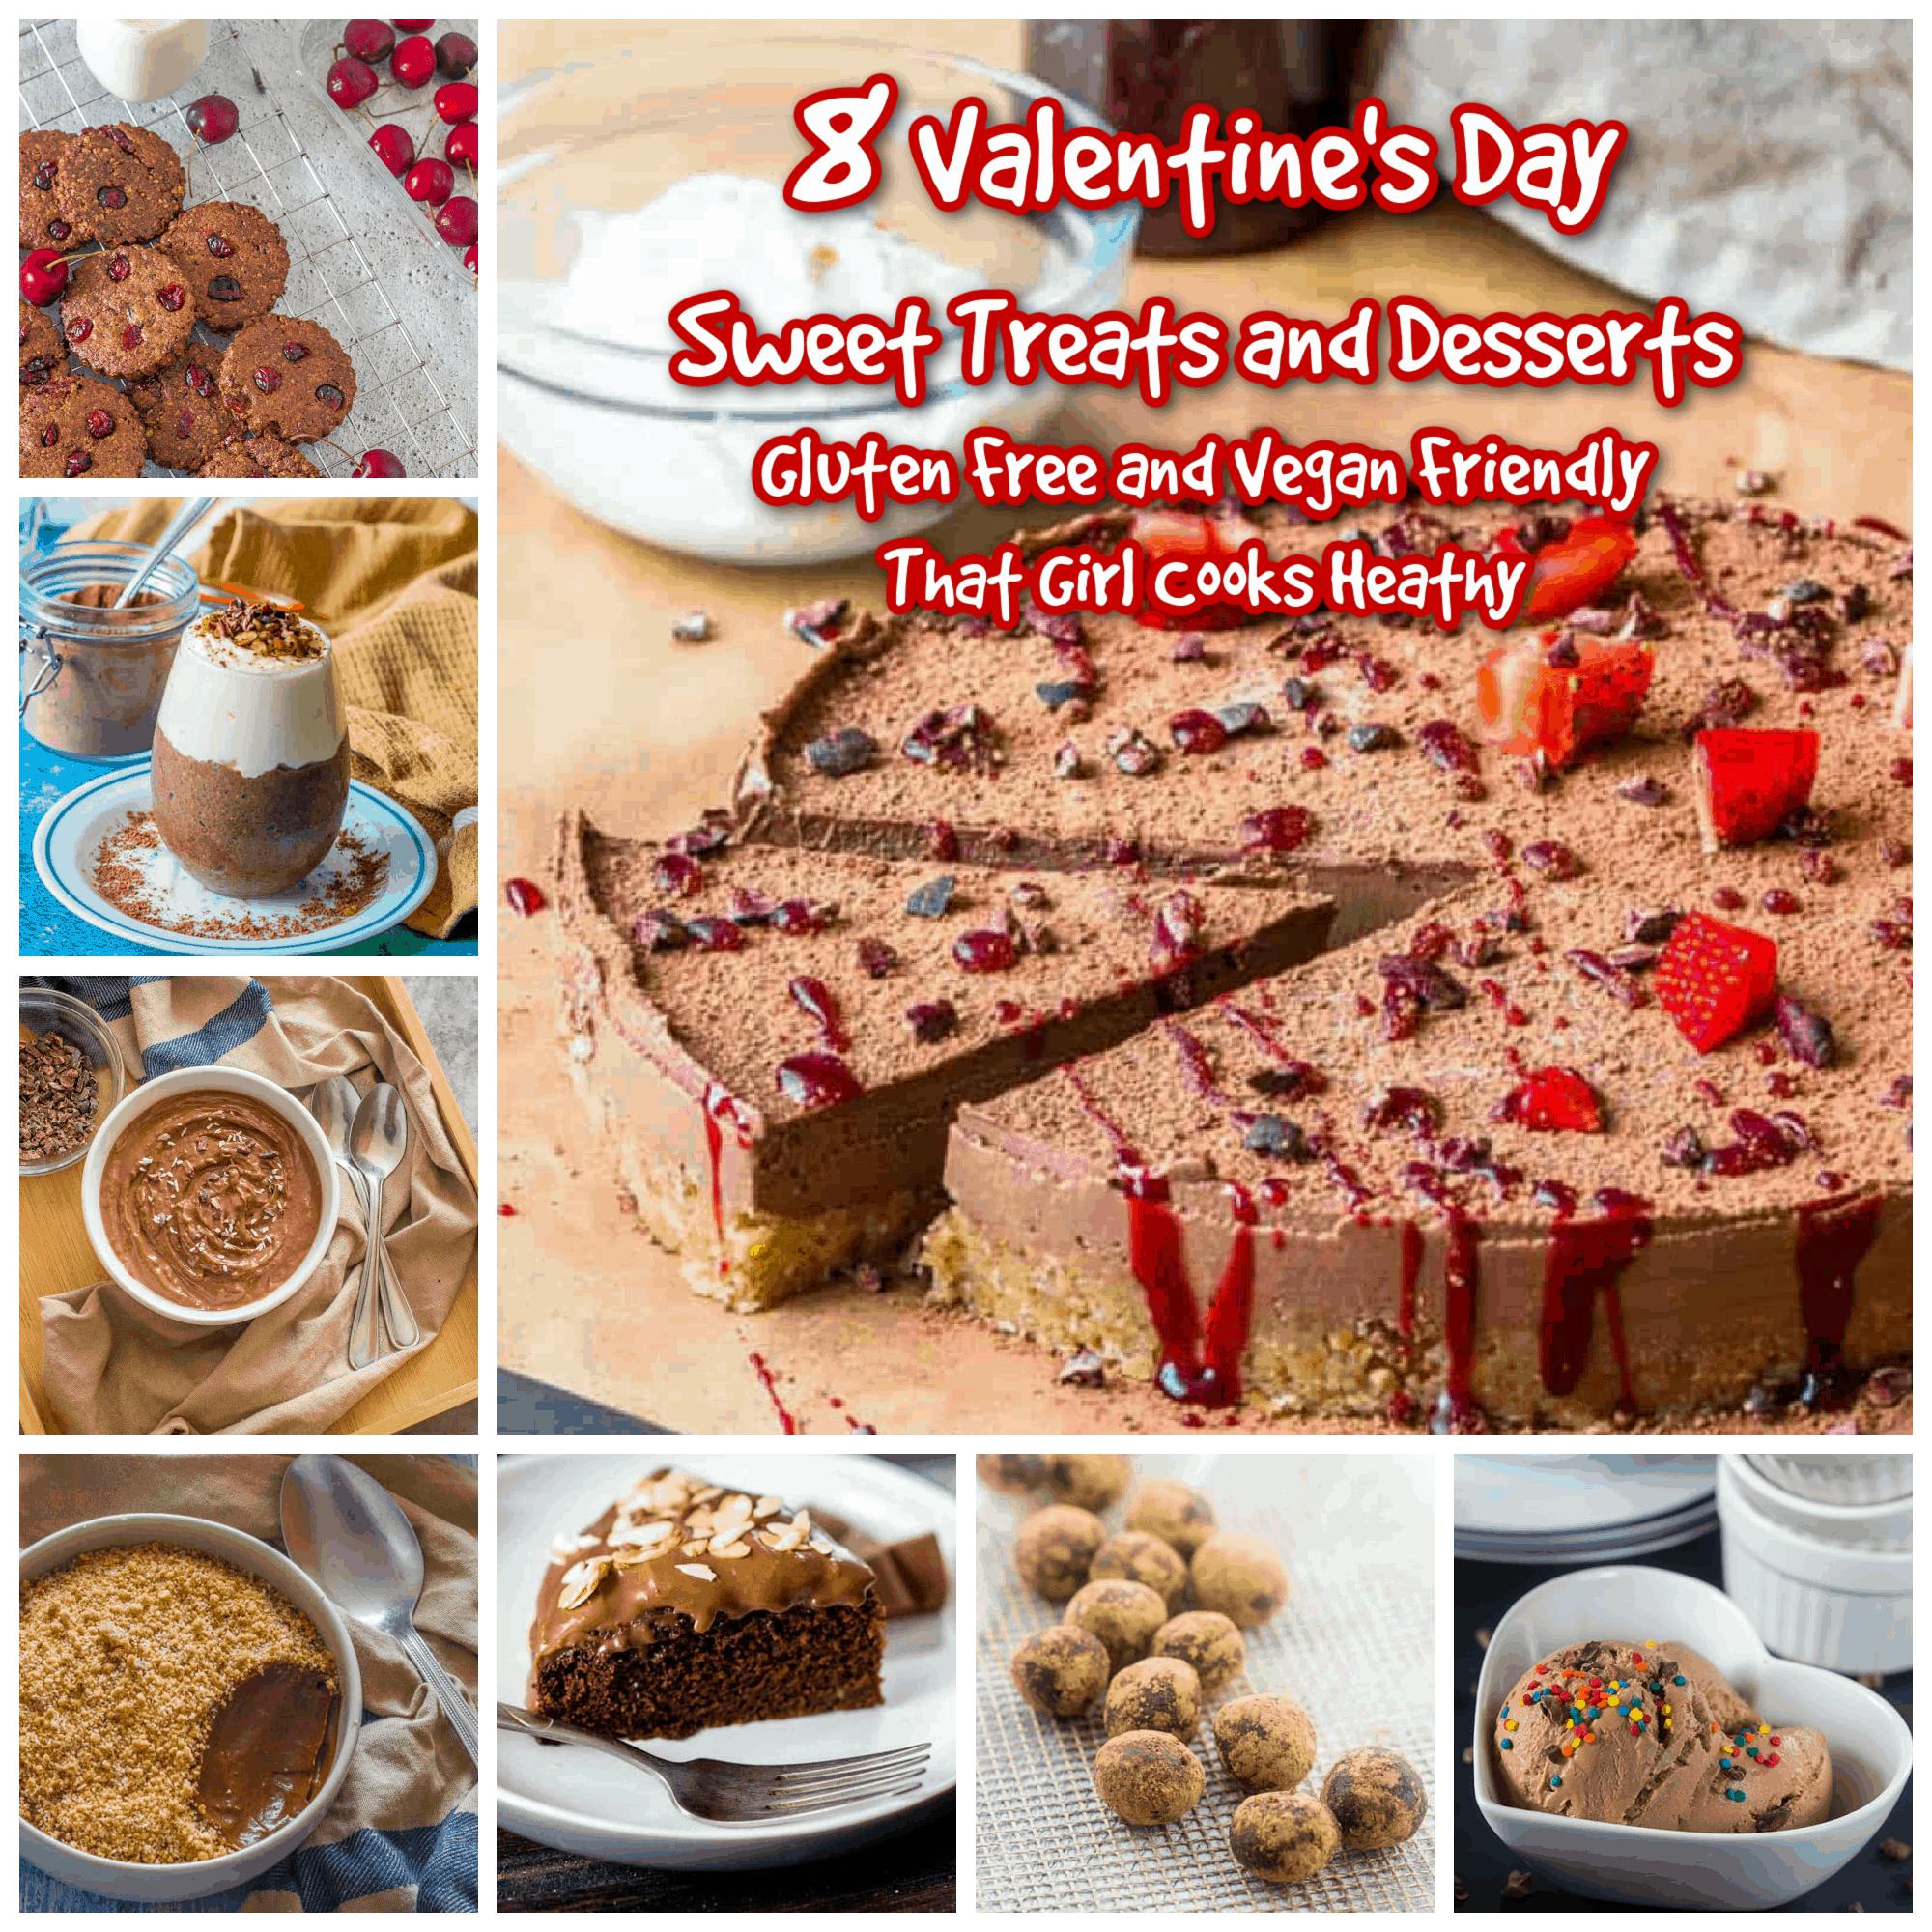 8 valentines sweet treats and desserts